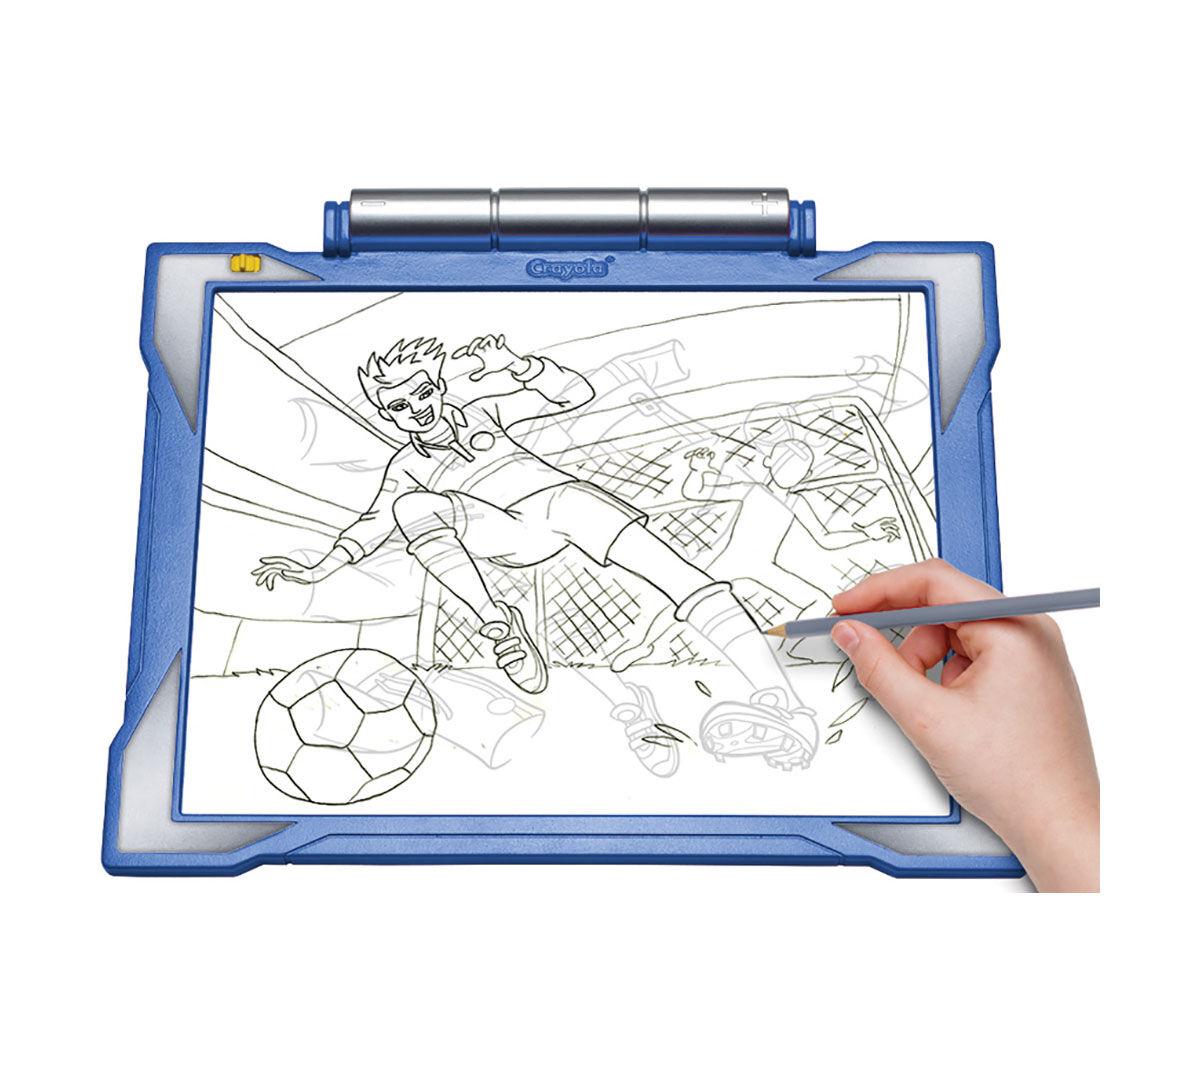 Crayola Sketch Pad Boxfirepress